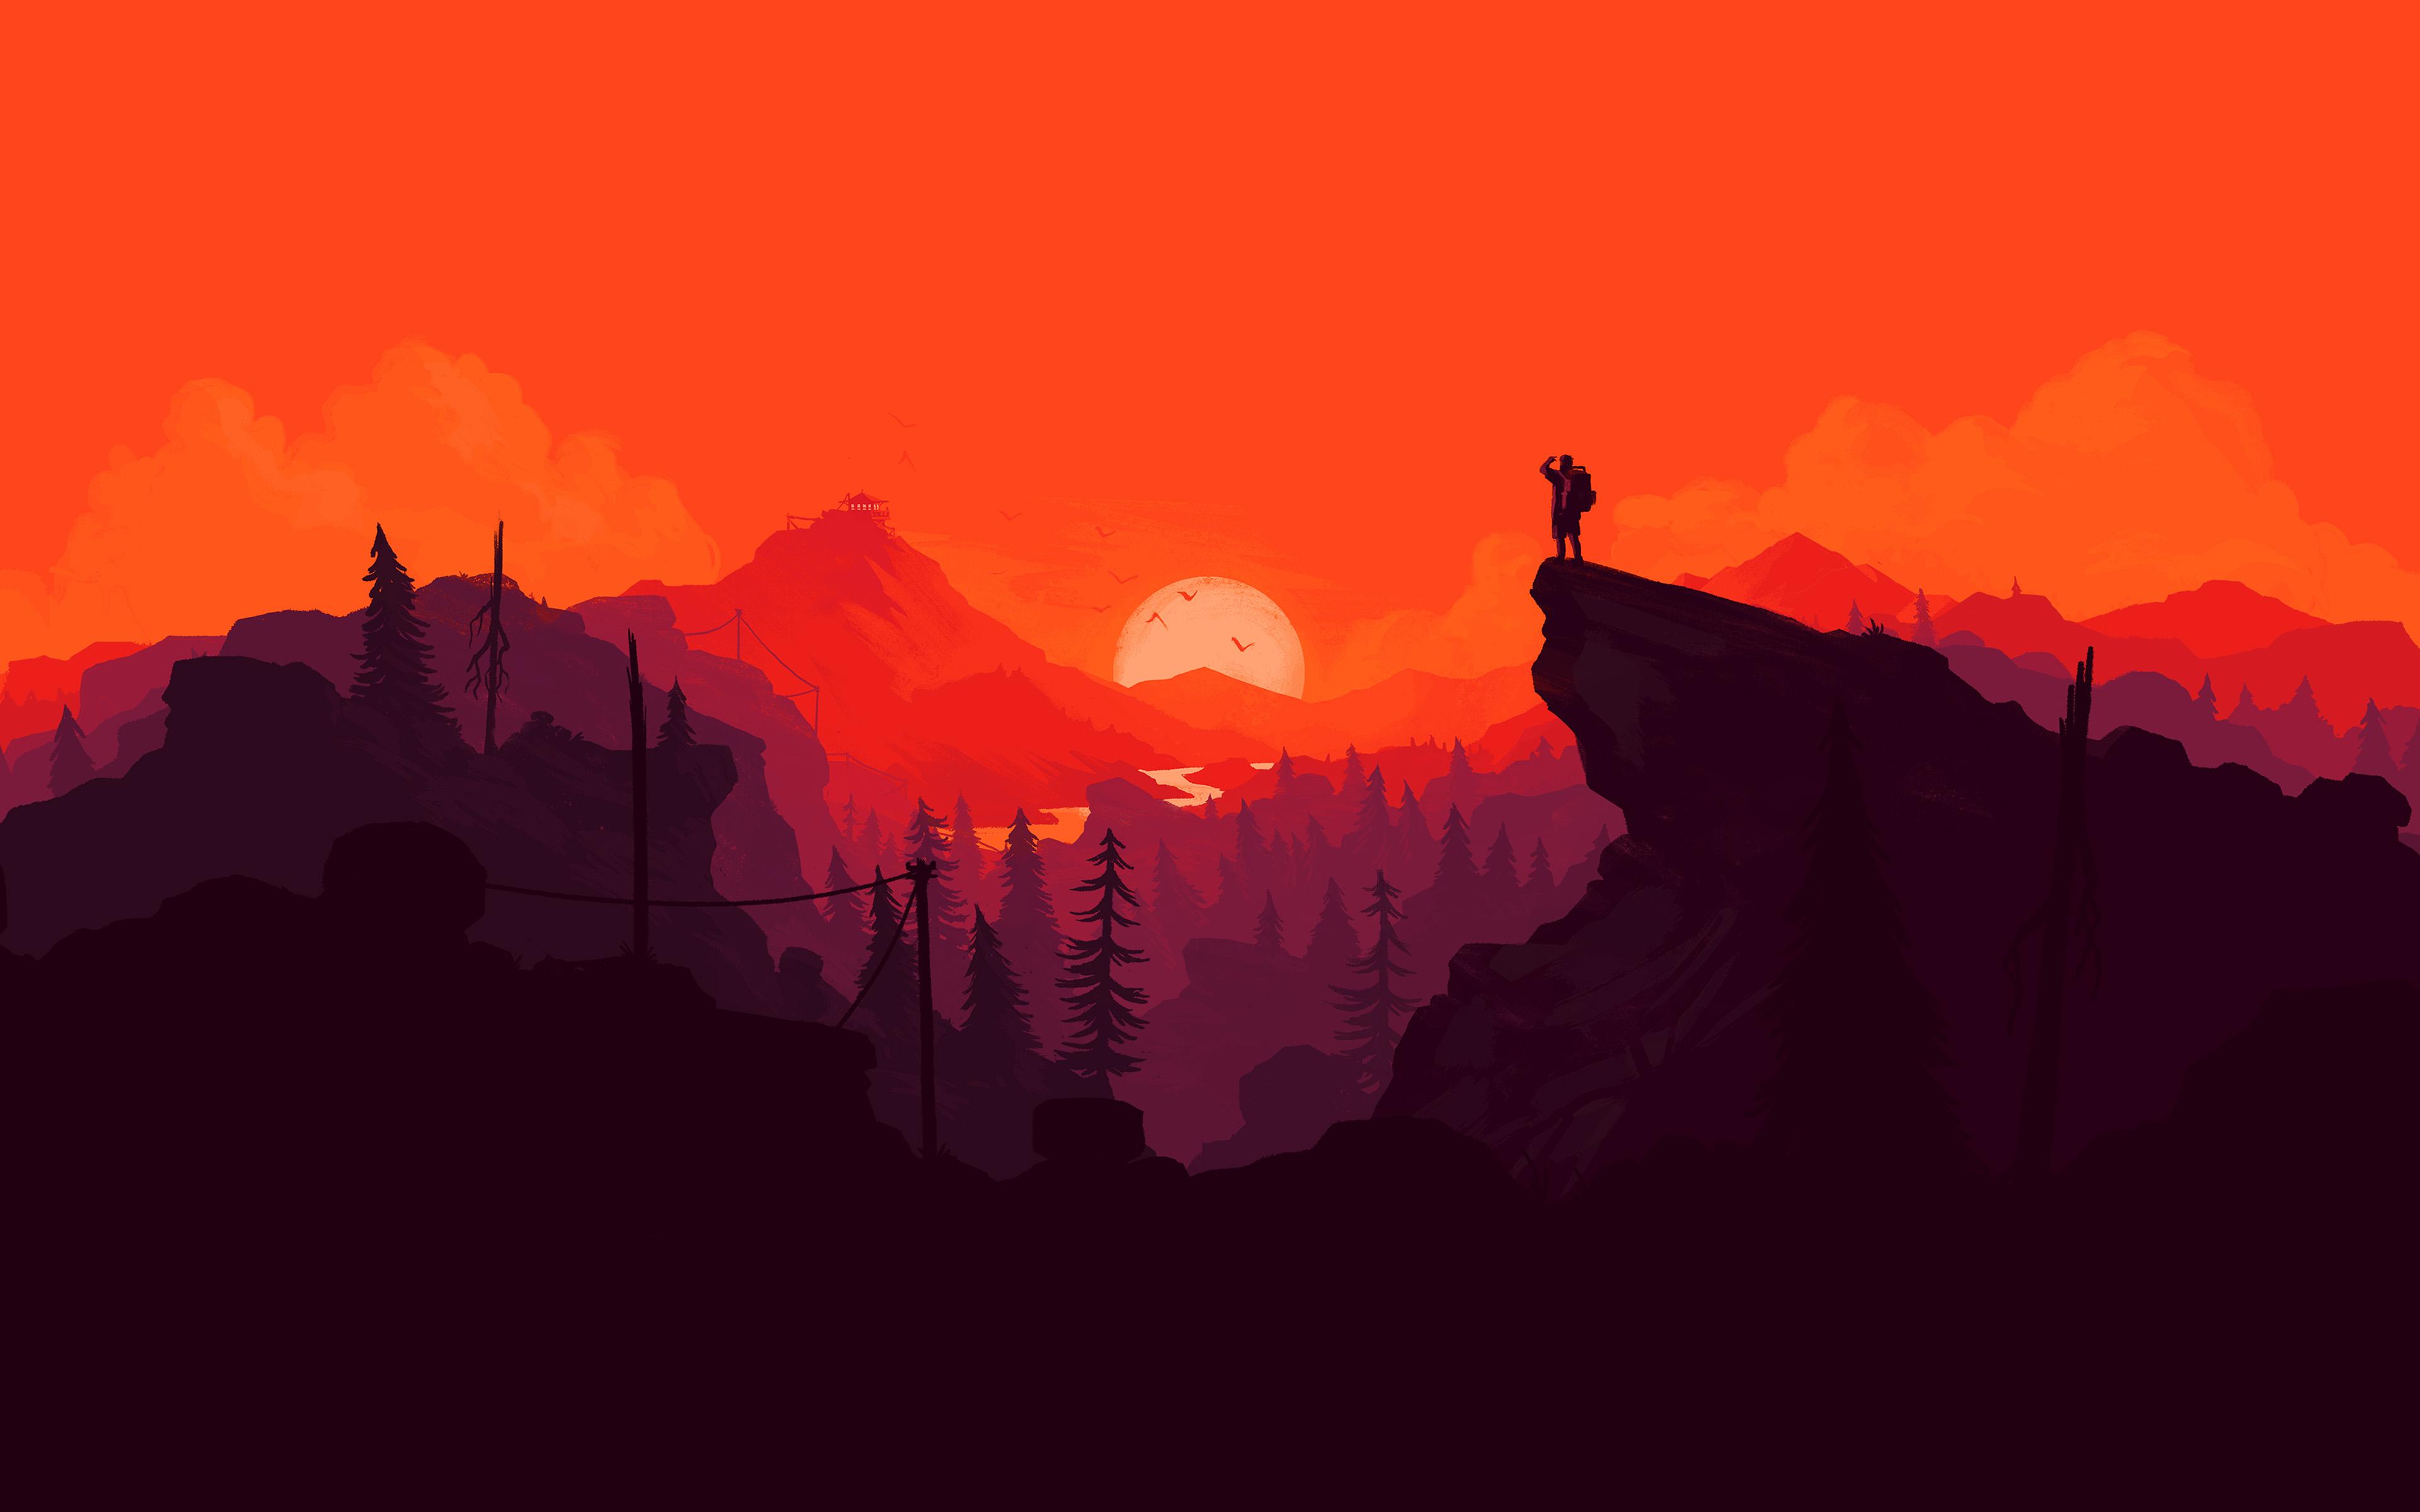 Firewatch Digital Art 4k, HD Games, 4k Wallpapers, Images ...